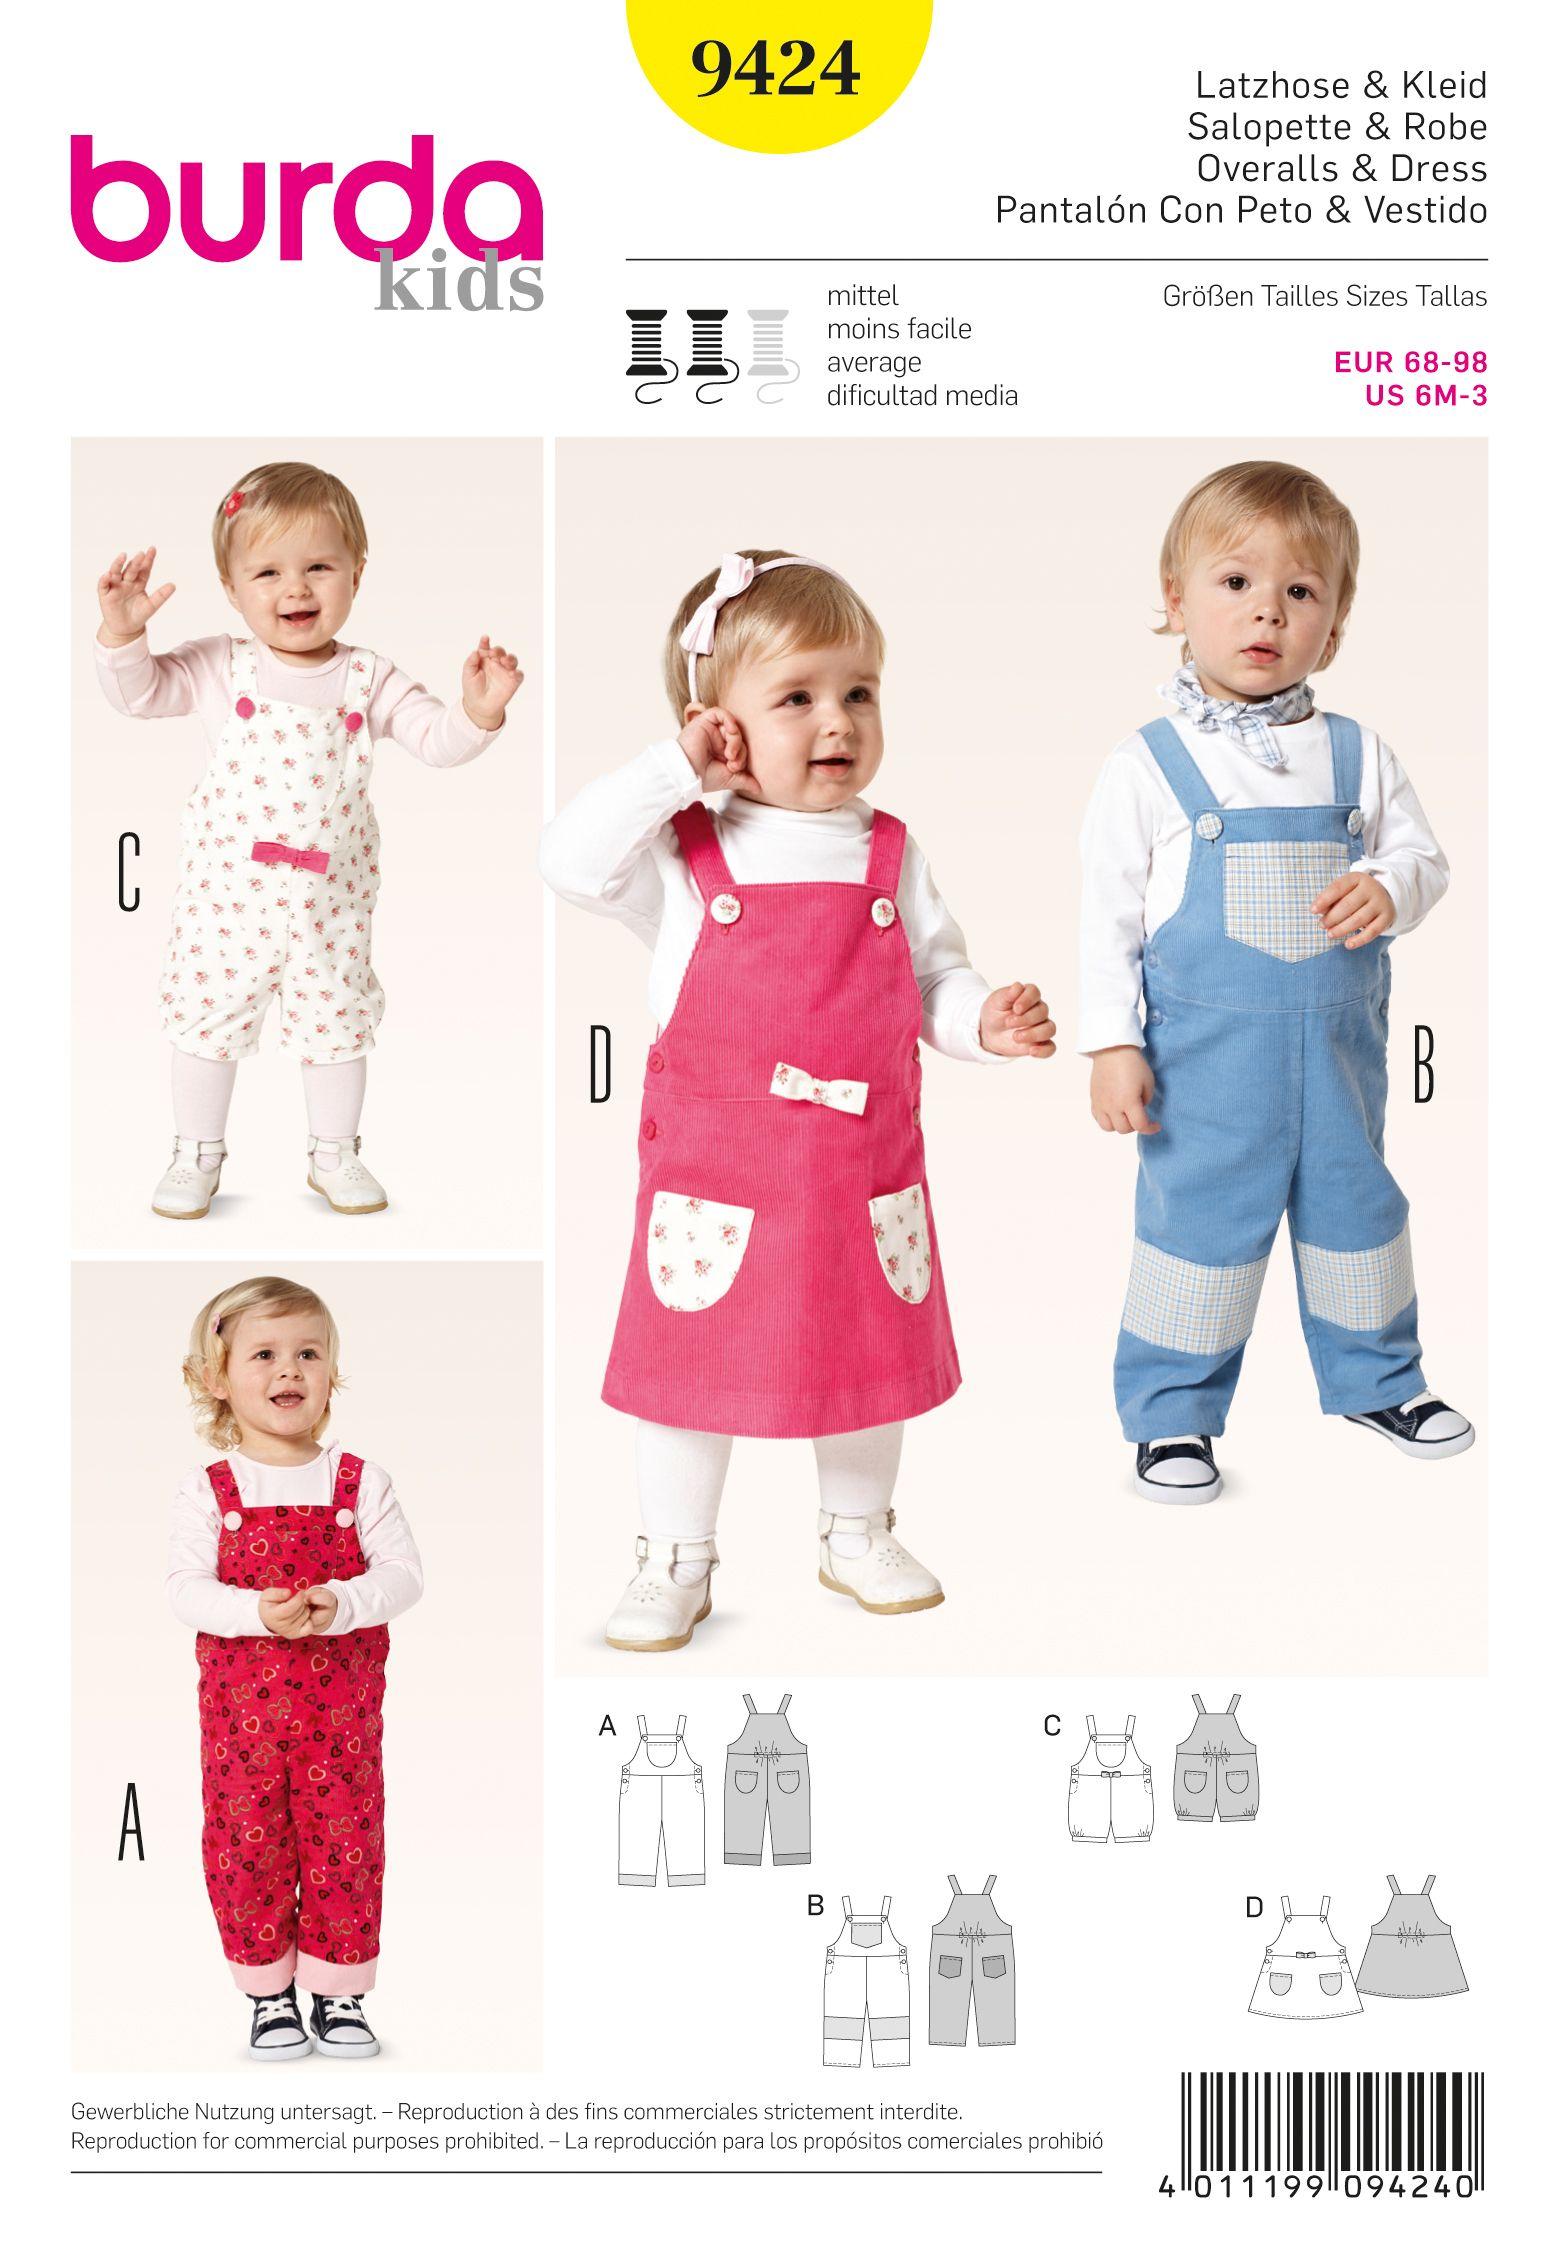 Burda 9424 Toddlers | Sewing patterns | Pinterest | Costura, Moda ...